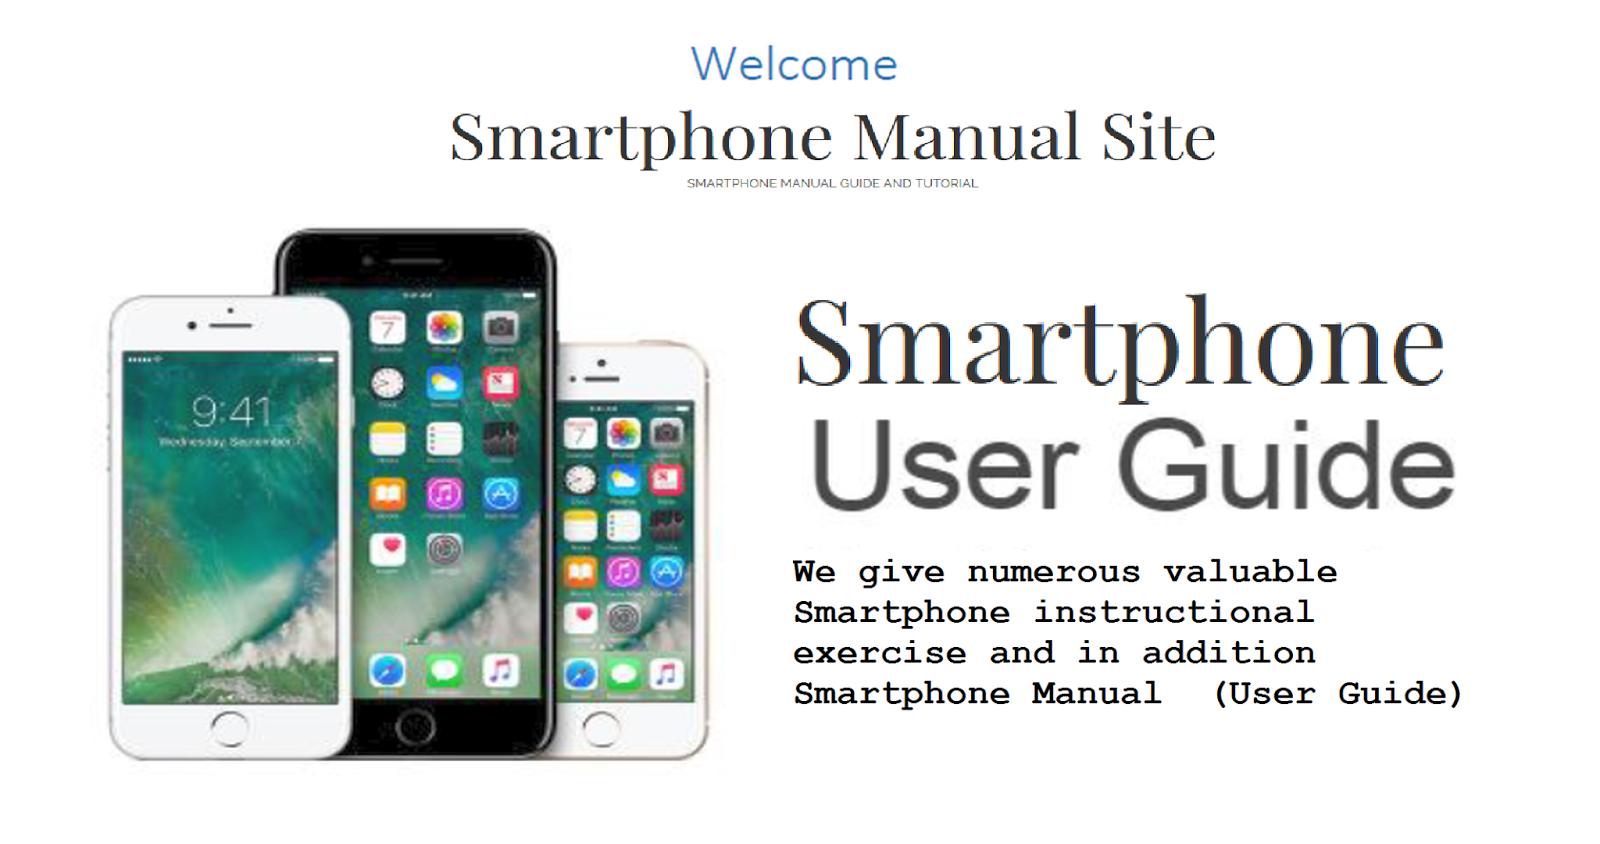 smartphone manual   user guide smartphone manual site Glycated Hemoglobin Lactate Dehydrogenase